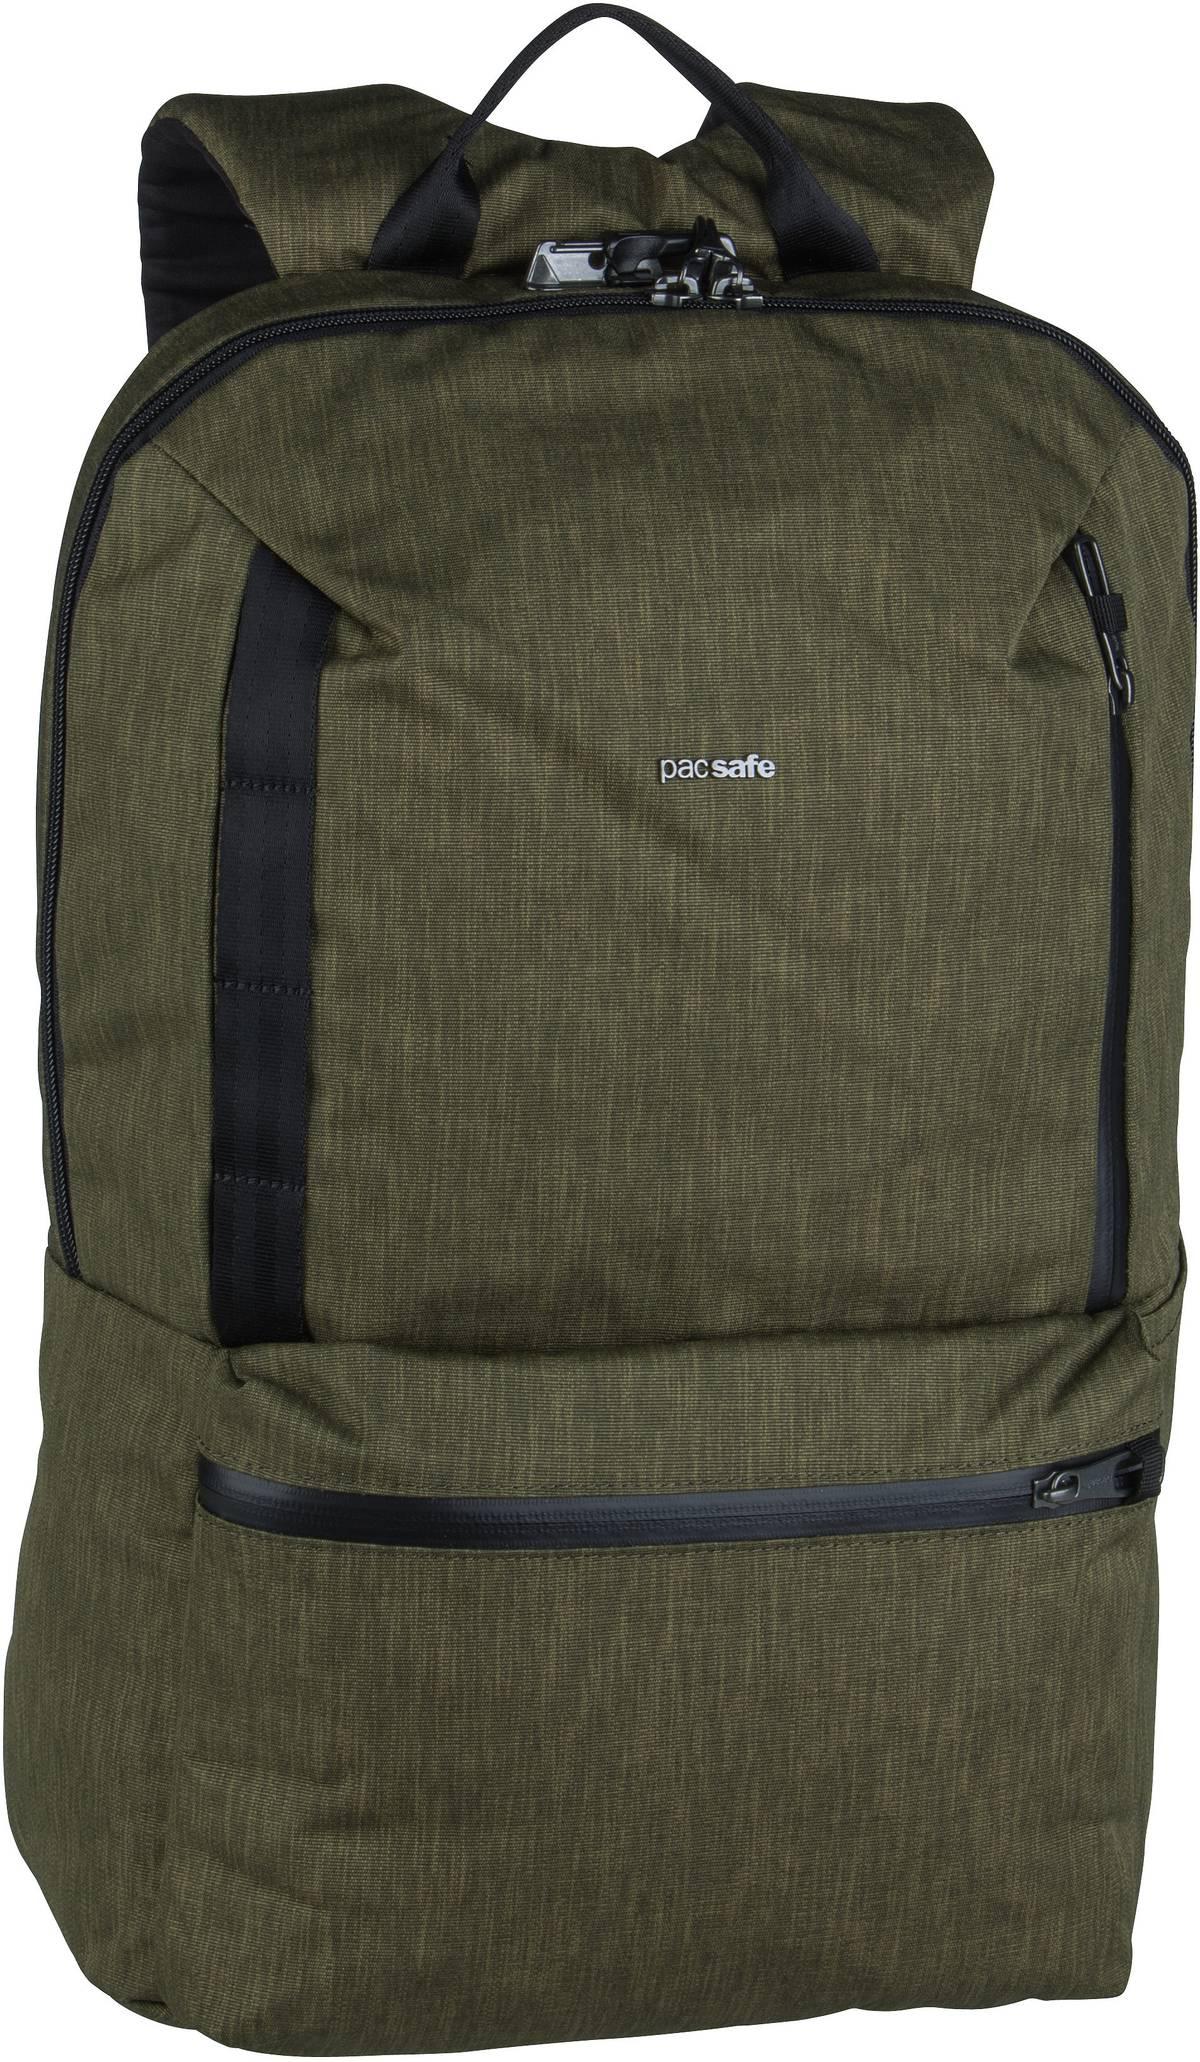 Rucksack / Daypack Metrosafe X Backpack Utility (20 Liter)